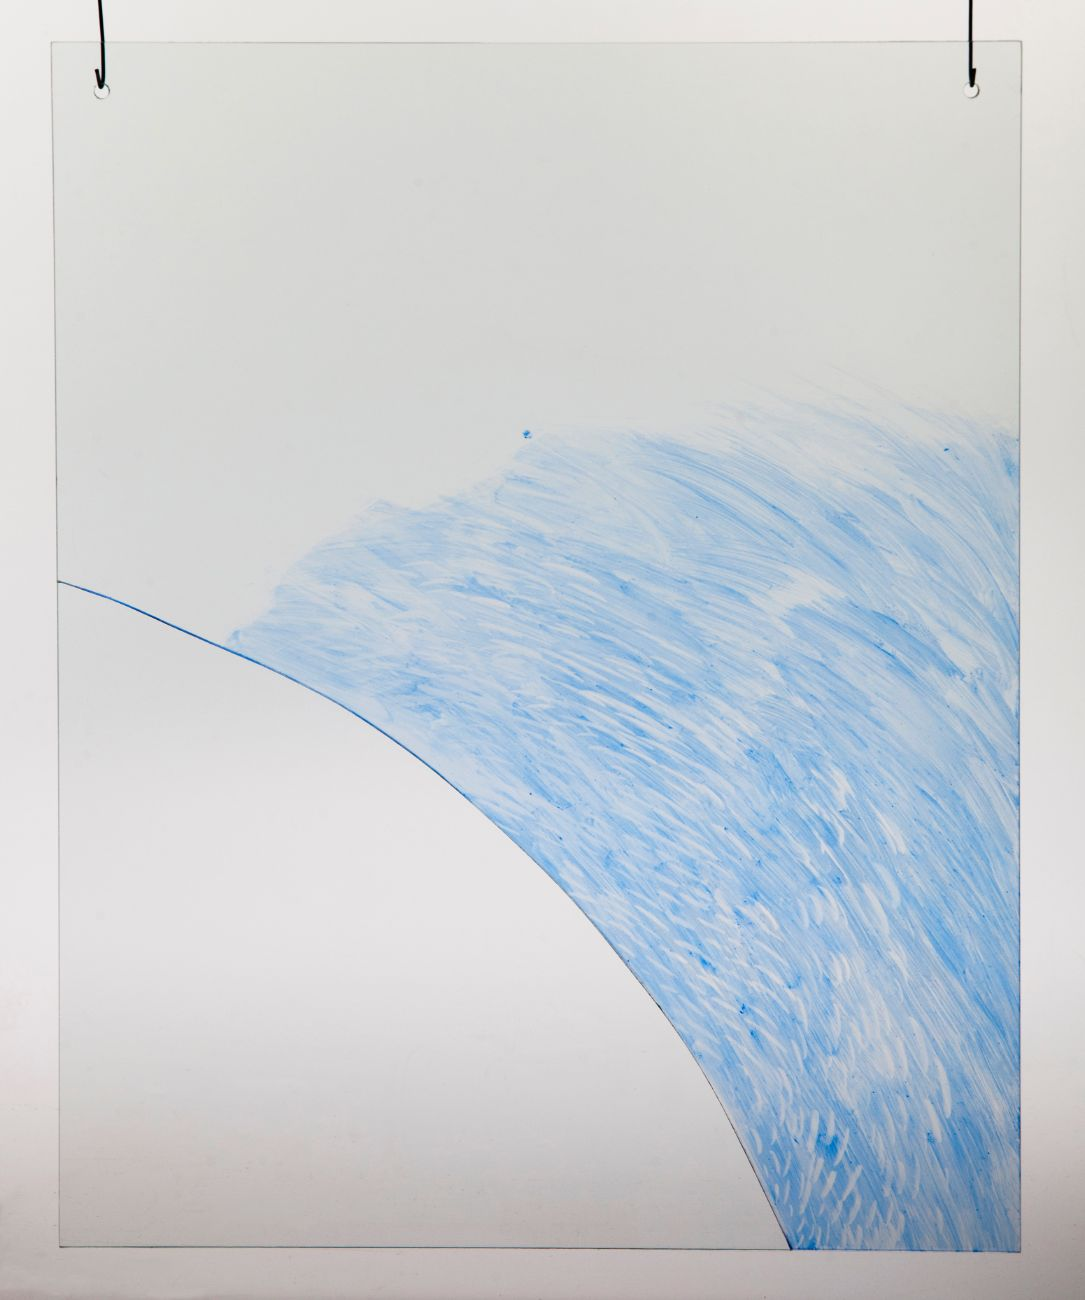 4, 40x50cm, maľba na skle, 2018